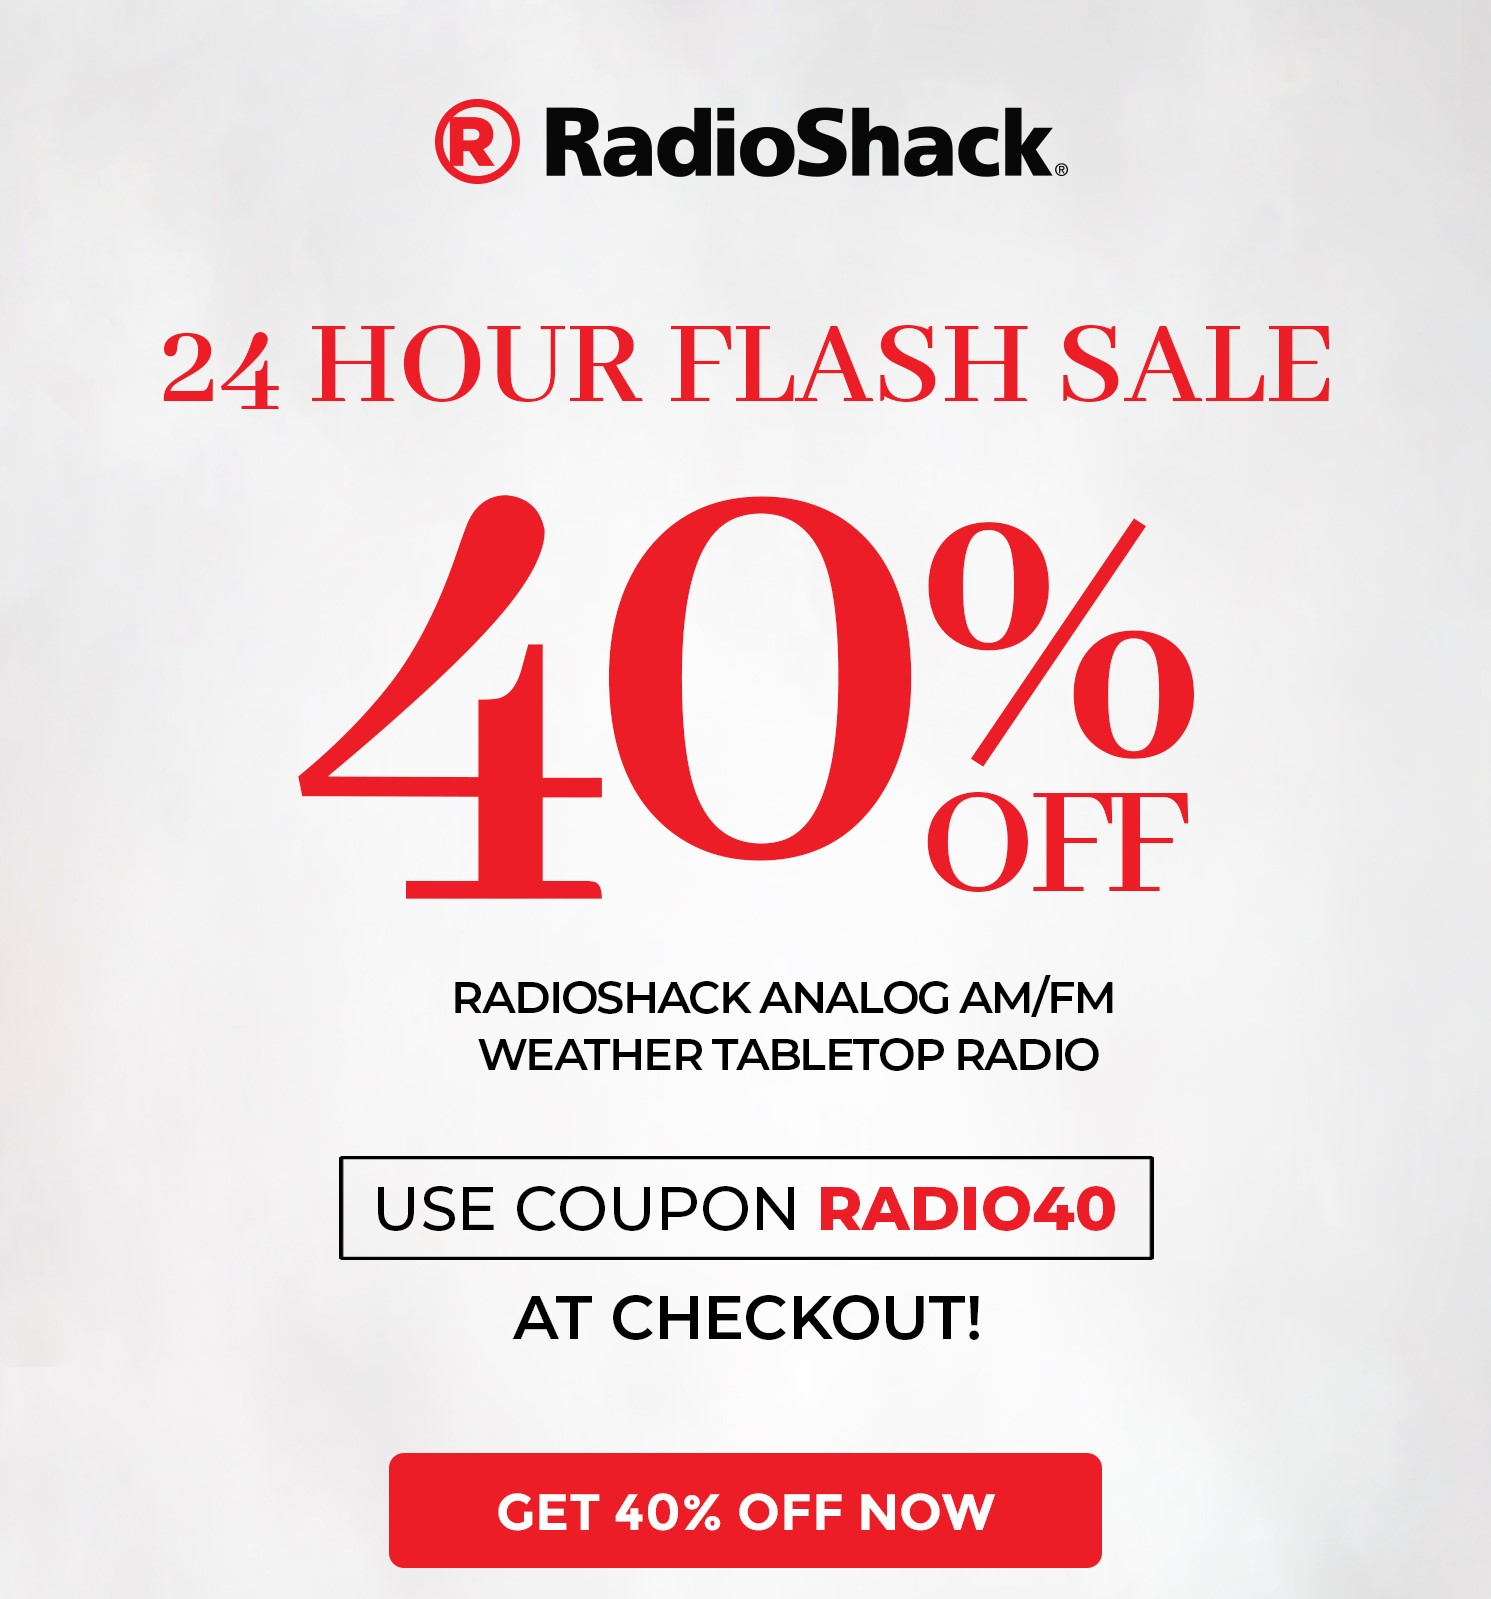 RadioShack Analog AM/FM Weather Tabletop Radio